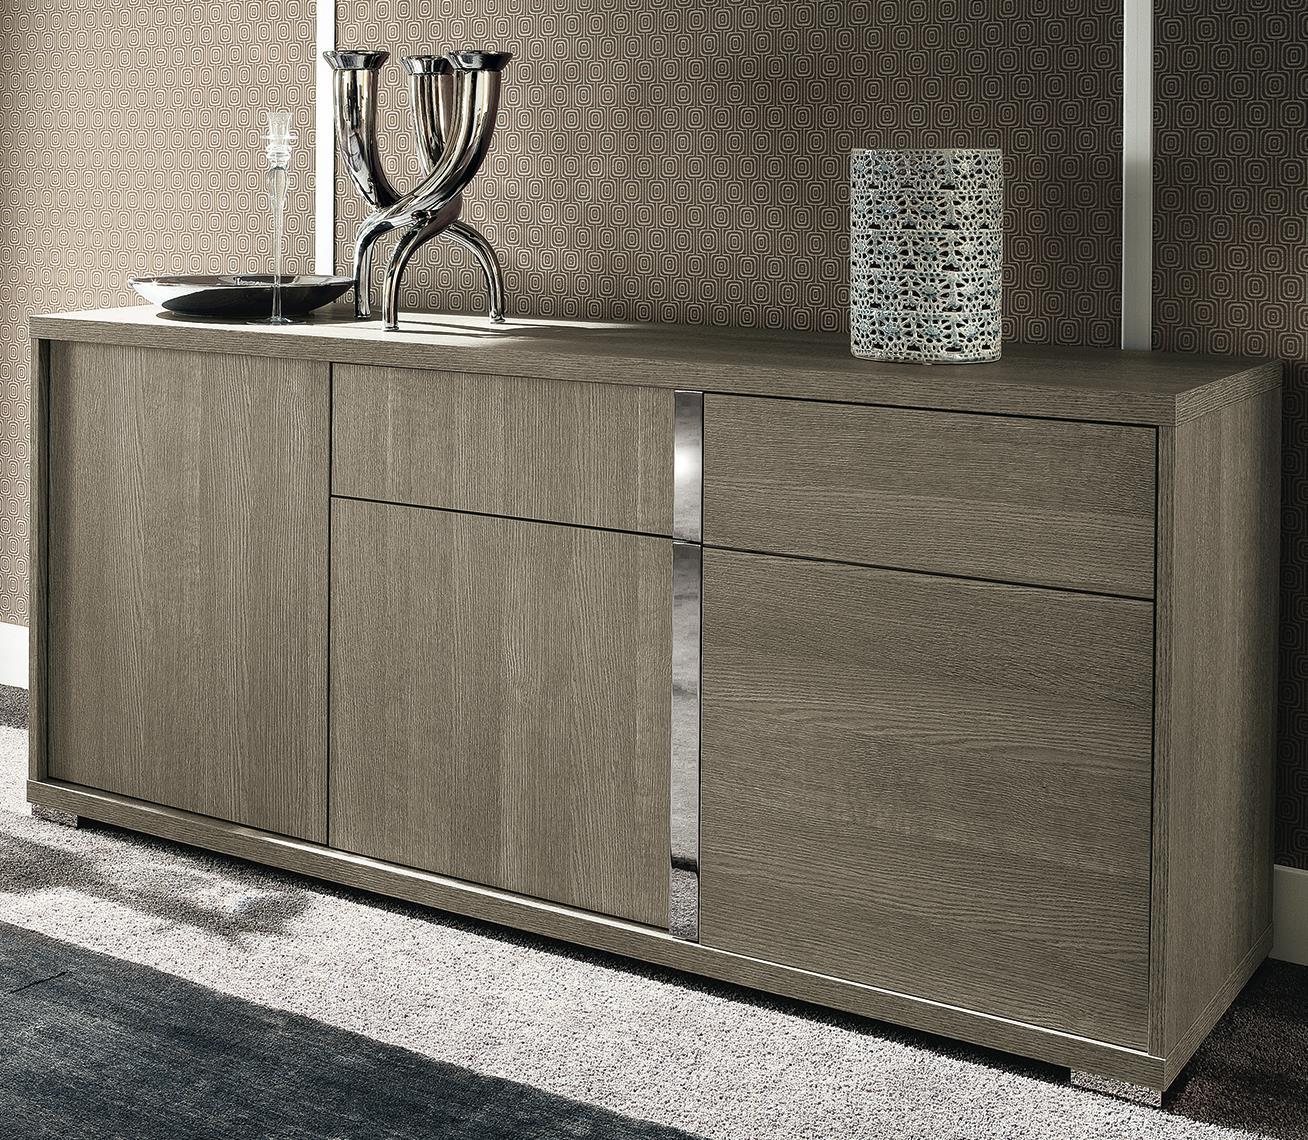 844434bc32 Alf Italia Tivoli KJTI610GR Contemporary Weathered Grey Three Door Buffet |  Corner Furniture | Buffets